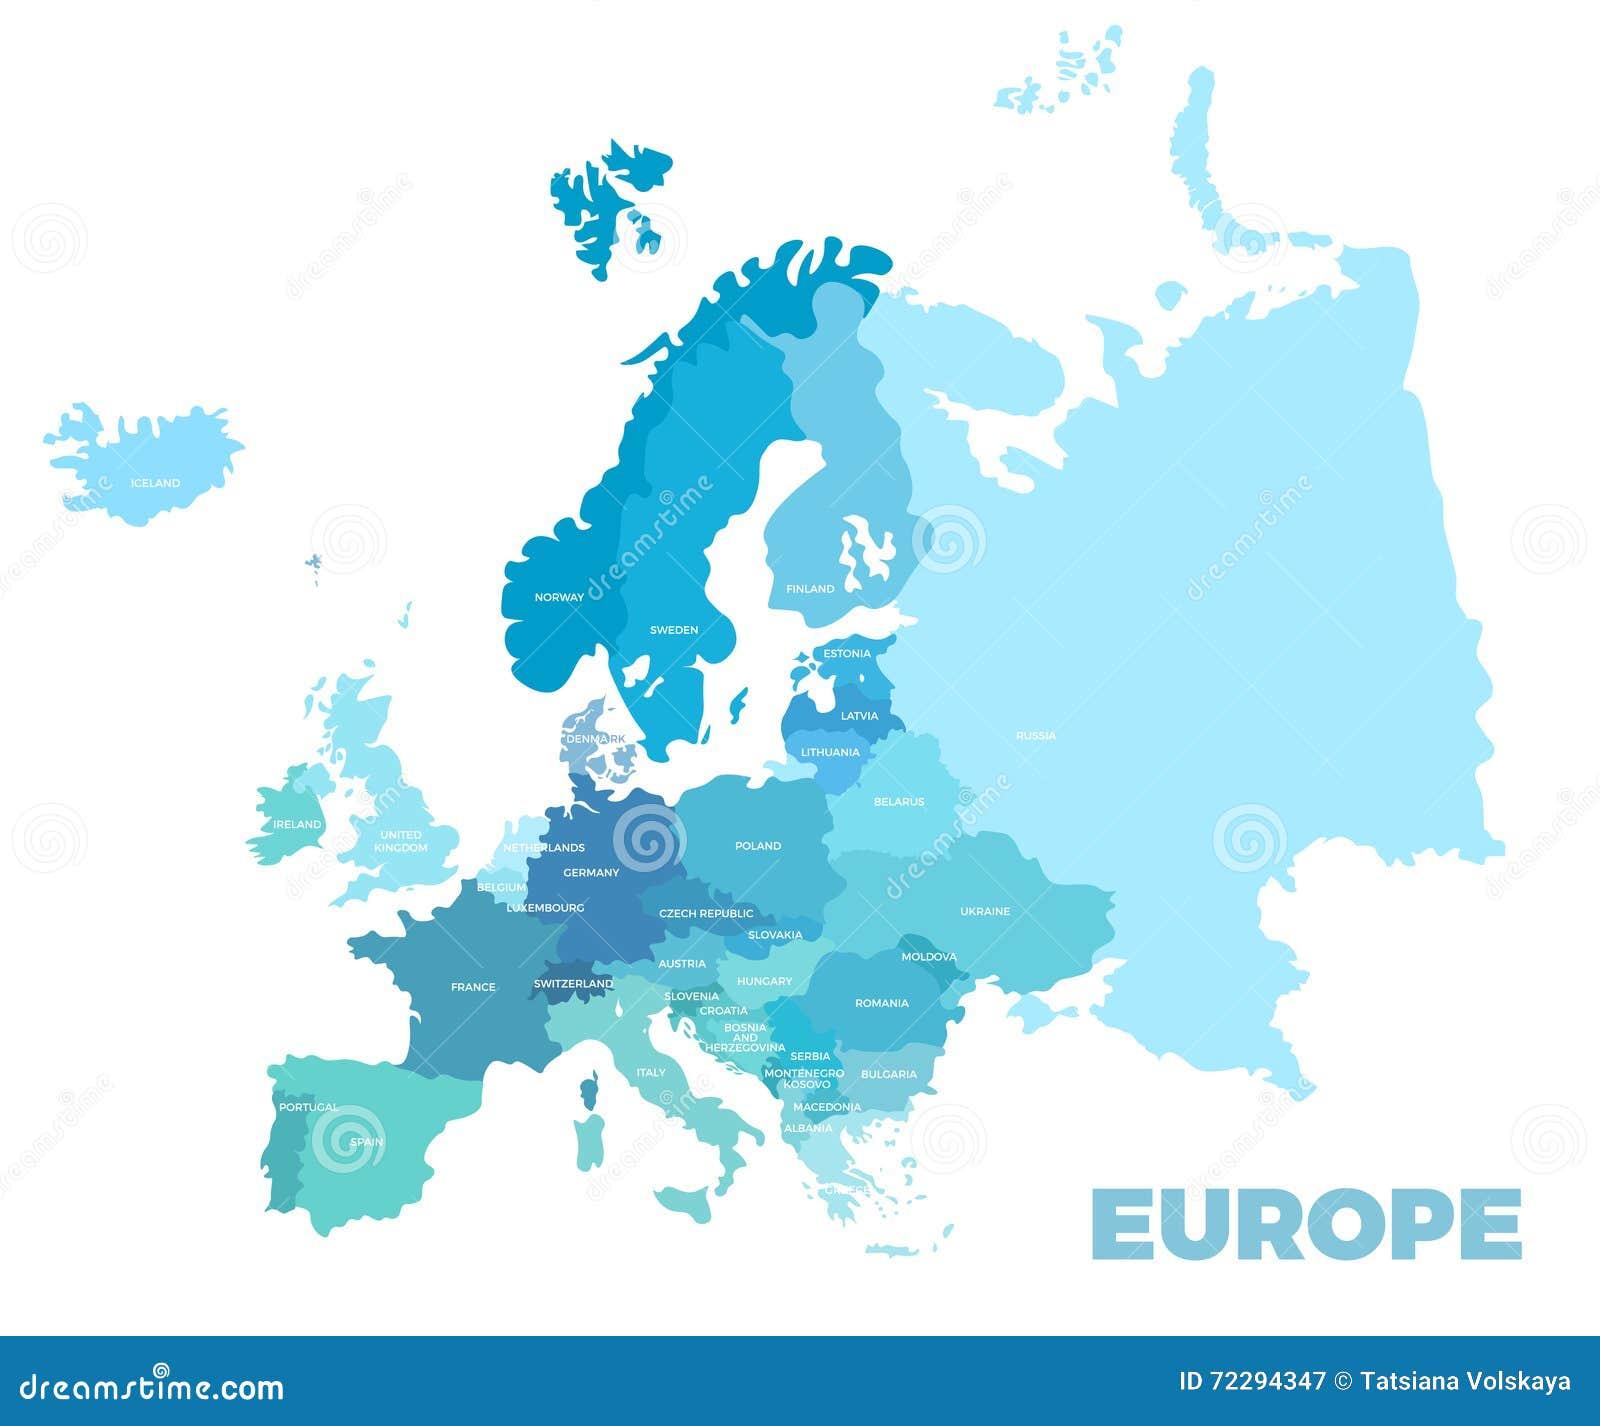 Europe modern detailed map stock vector. Illustration of ...